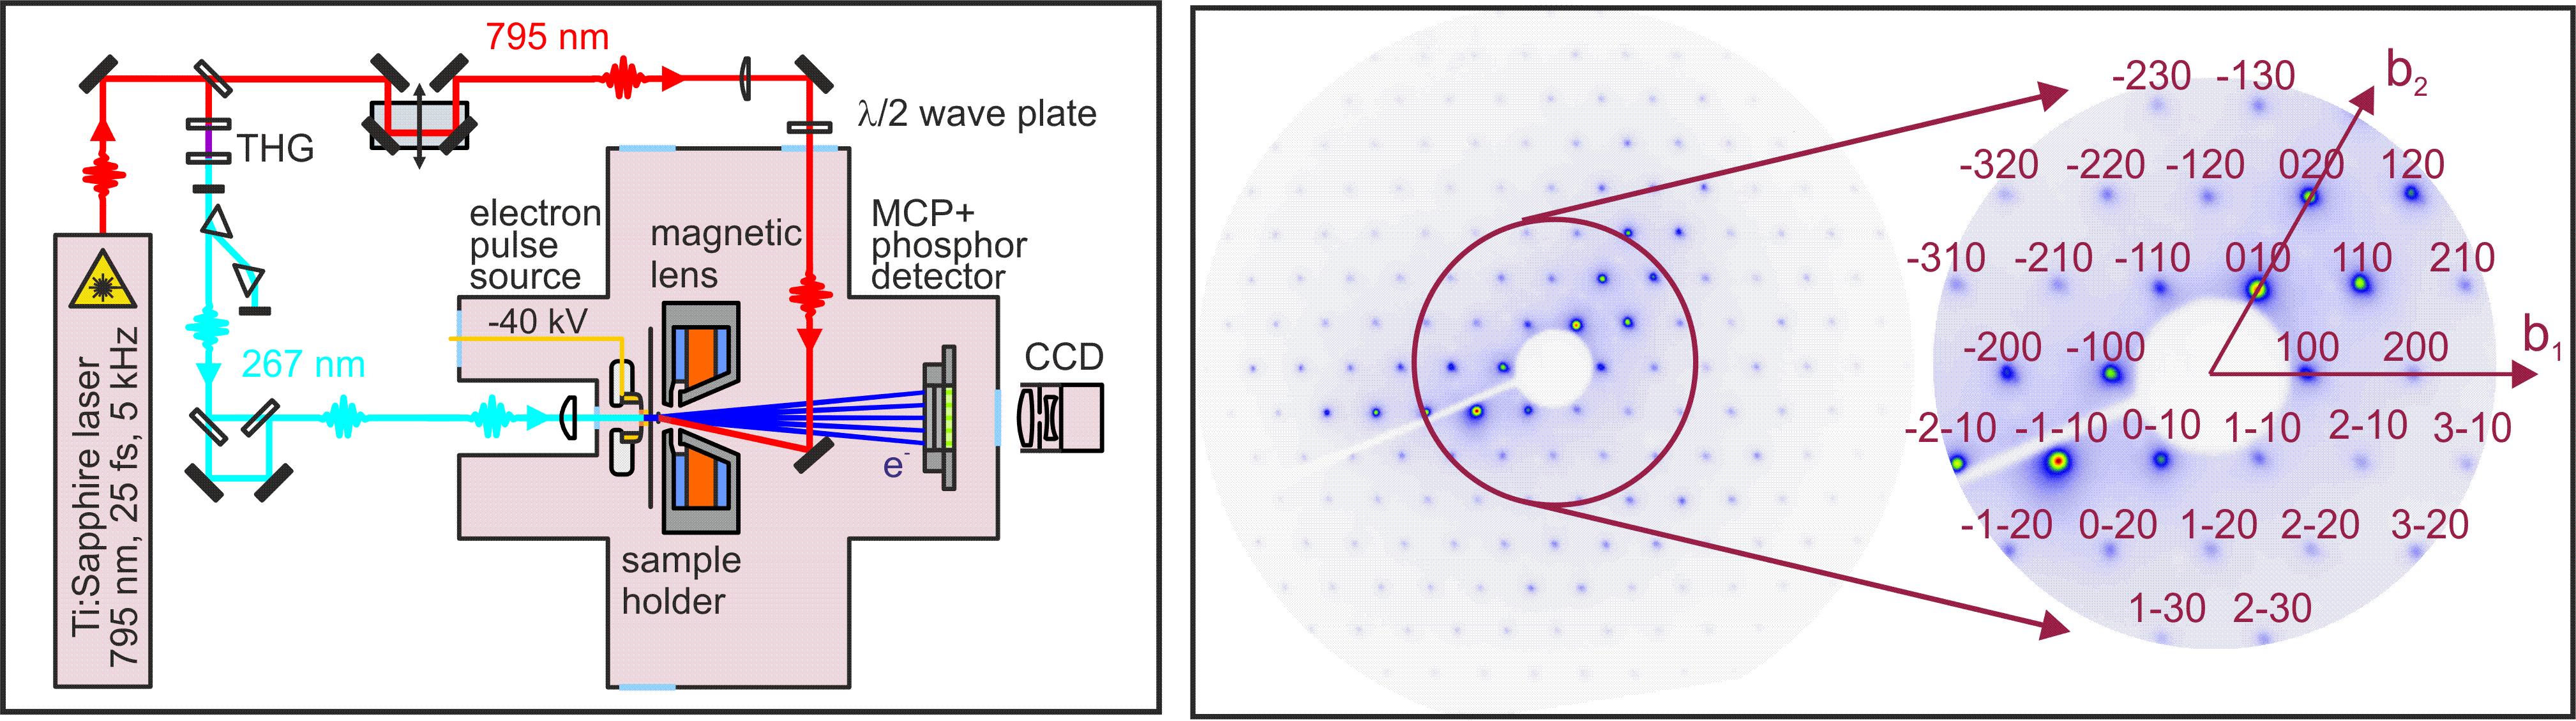 Fig. 1. Left: Ultrafast Electron Diffraction-setup. Right: Measured Electron Diffraction Pattern of Molybdenum disulfide.